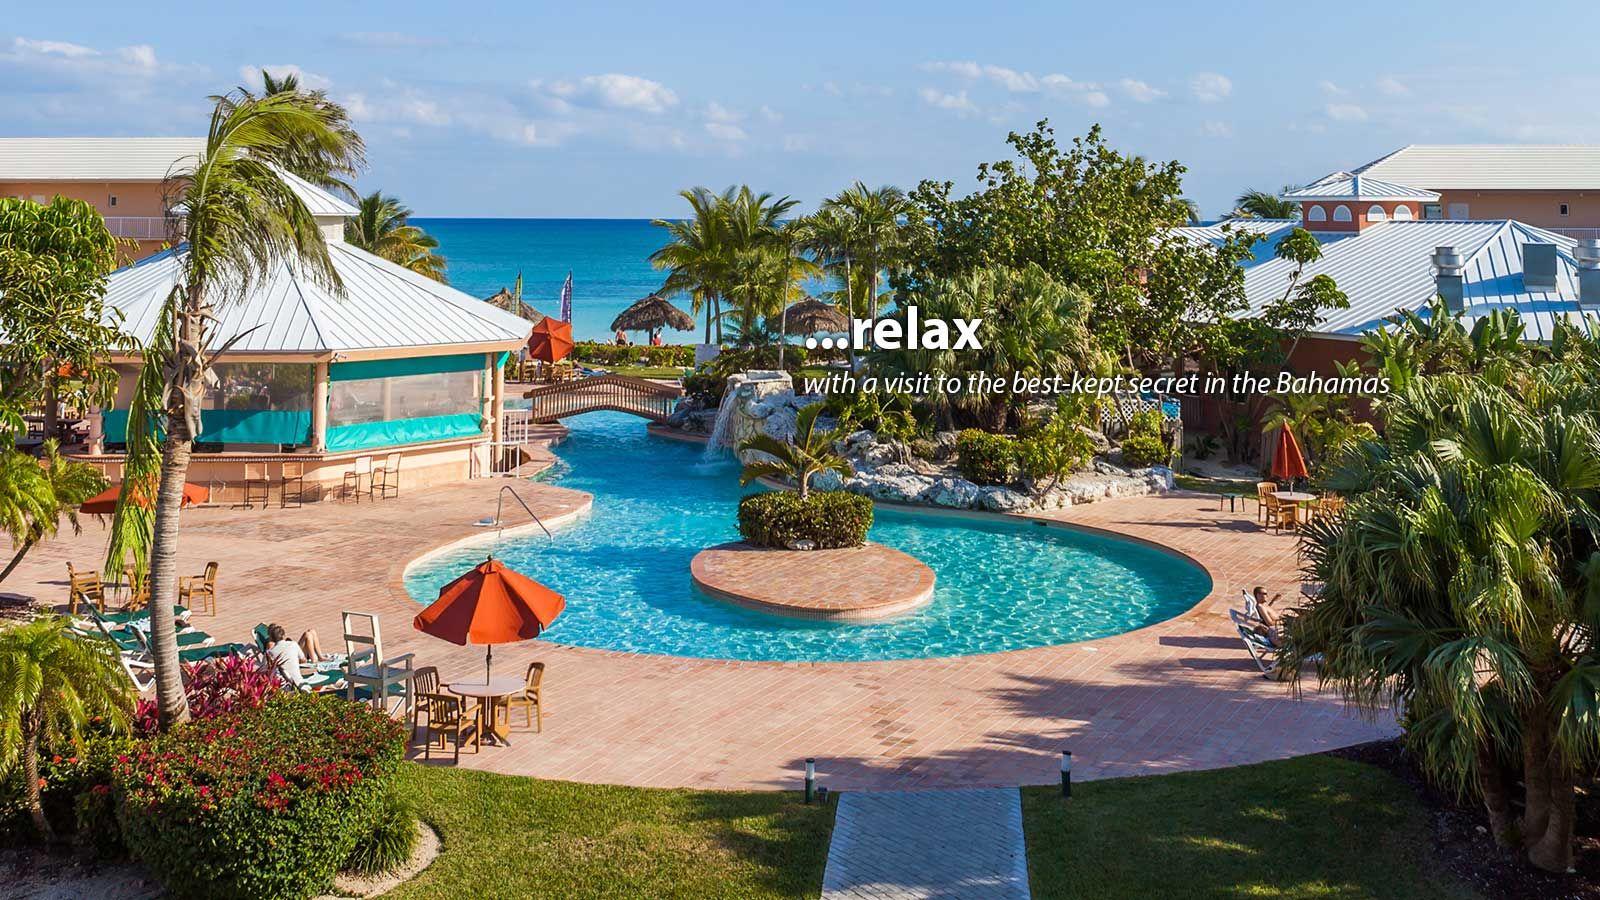 Island Seas Resort On Grand Bahama Bahamas Vacation Freeport Hotel